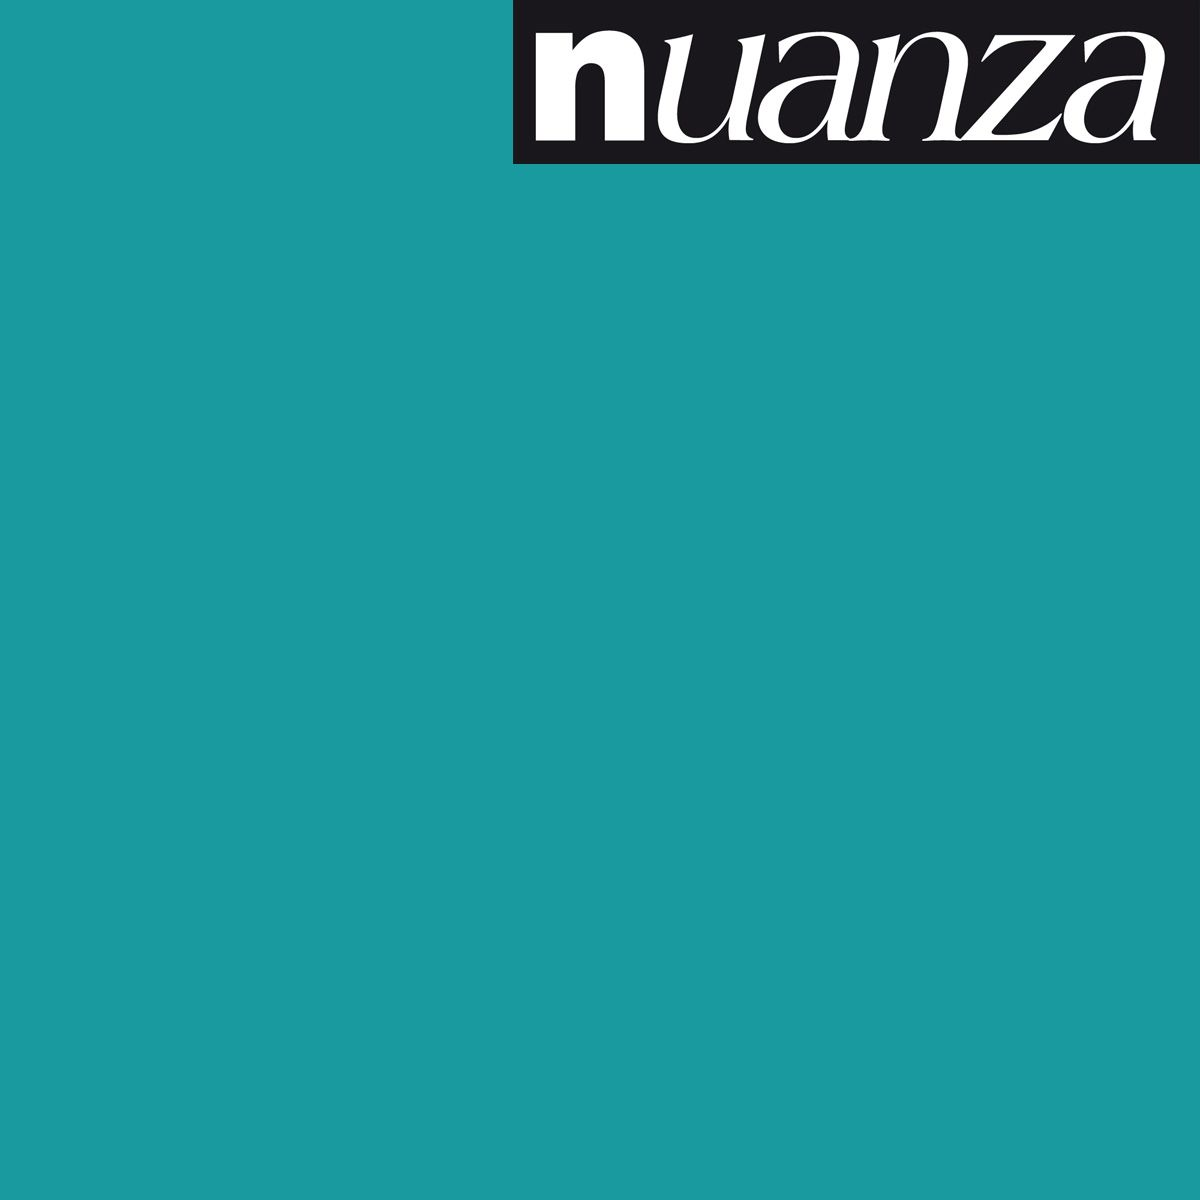 Peinture bleu lagon satin multisupports Nuanza 2.5l